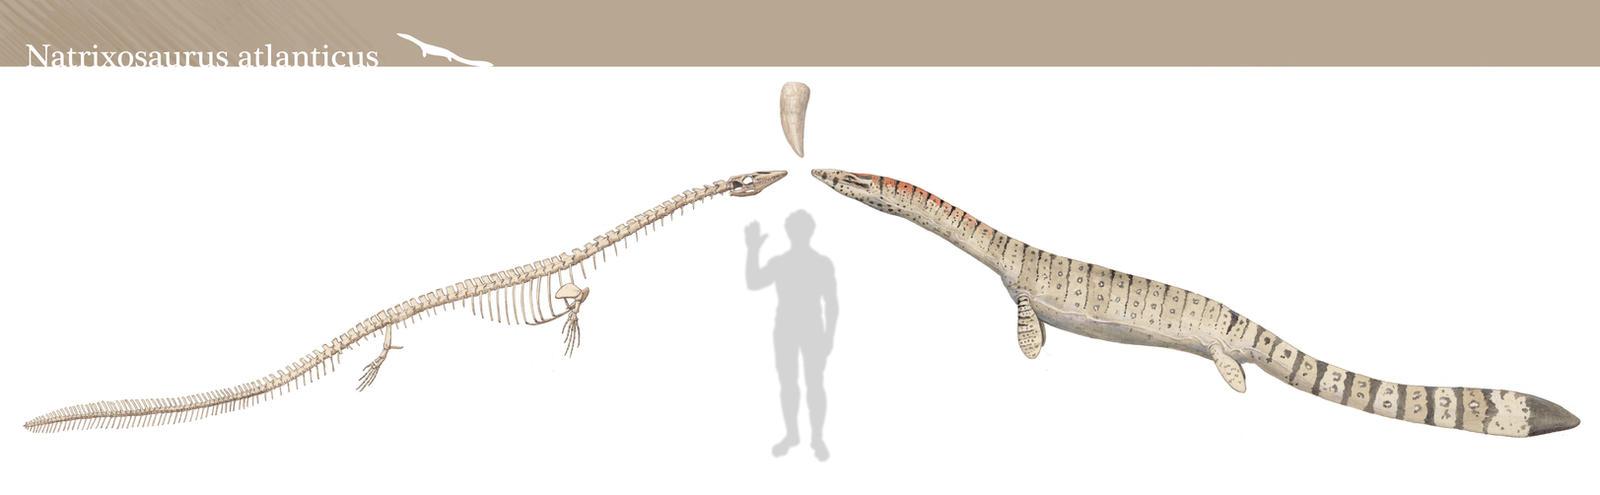 Natrixosaurus atlanticus